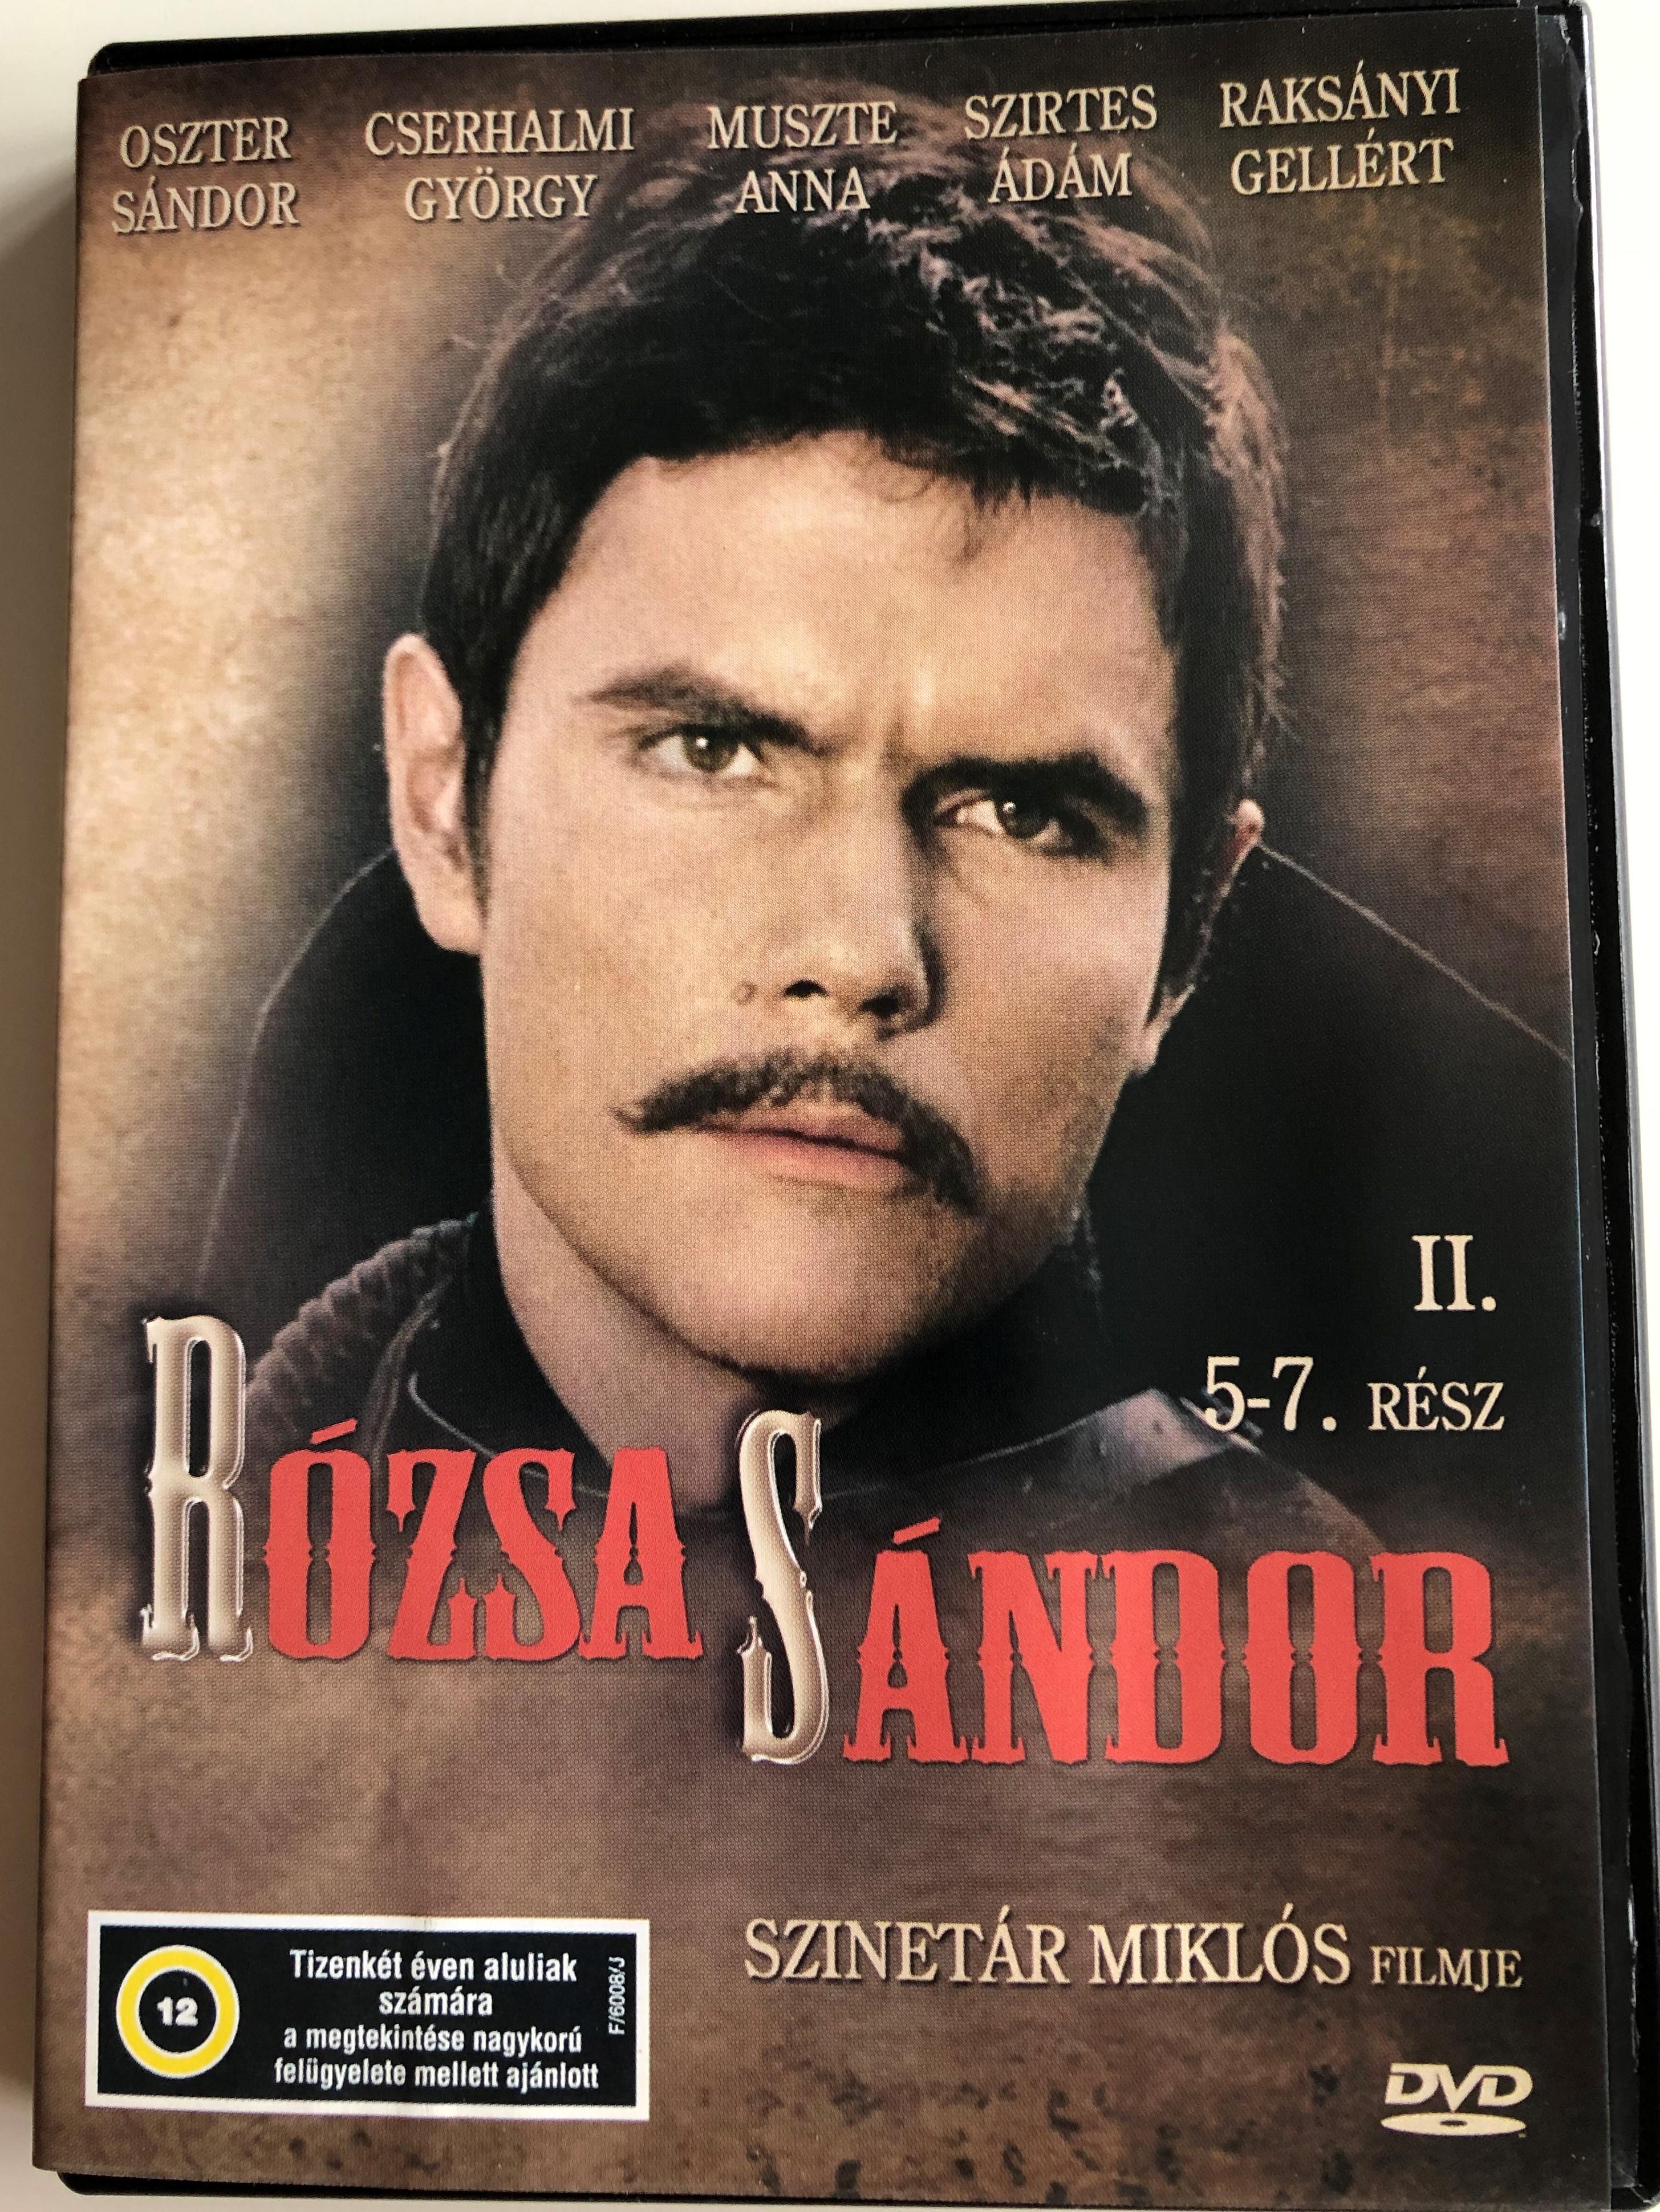 r-zsa-s-ndor-ii.-dvd-1971-episodes-5-7-directed-by-szinet-r-mikl-s-starring-oszter-s-ndor-cserhalmi-gy-rgy-raks-nyi-gell-rt-gy-rgy-l-szl-muszte-anna-szirtes-d-m-1-.jpg